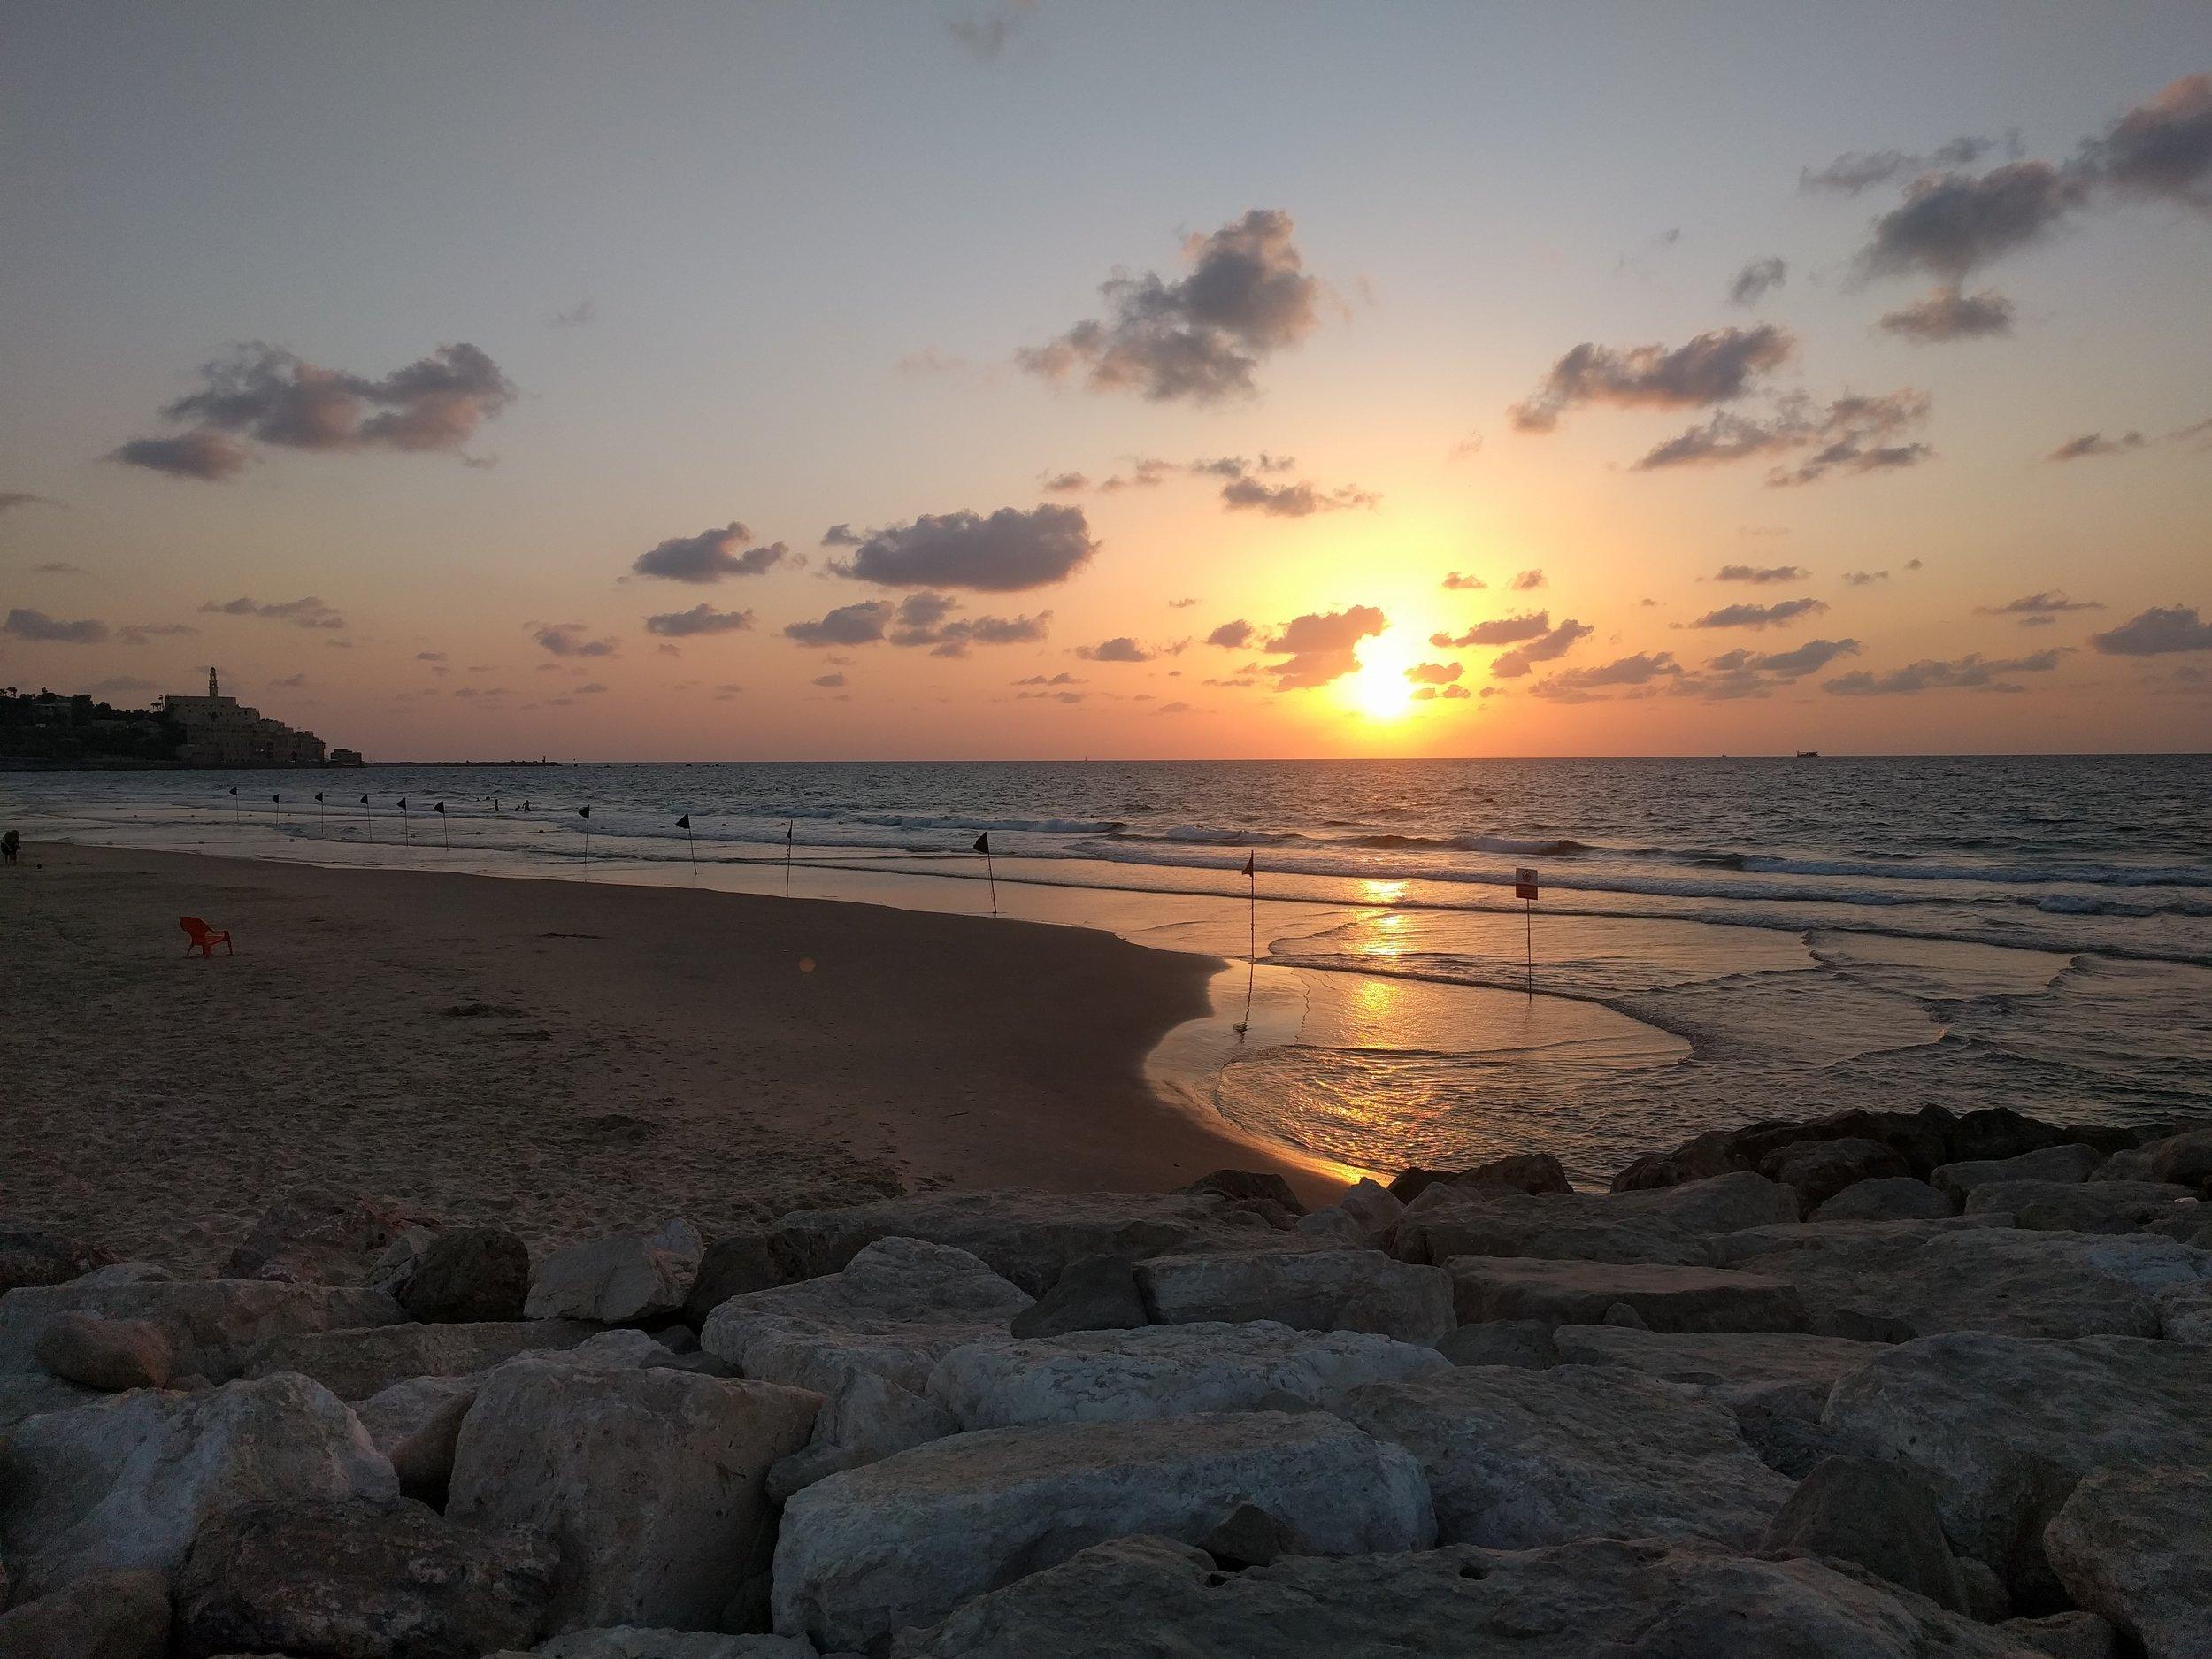 Sunset from the boardwalk in Tel Aviv